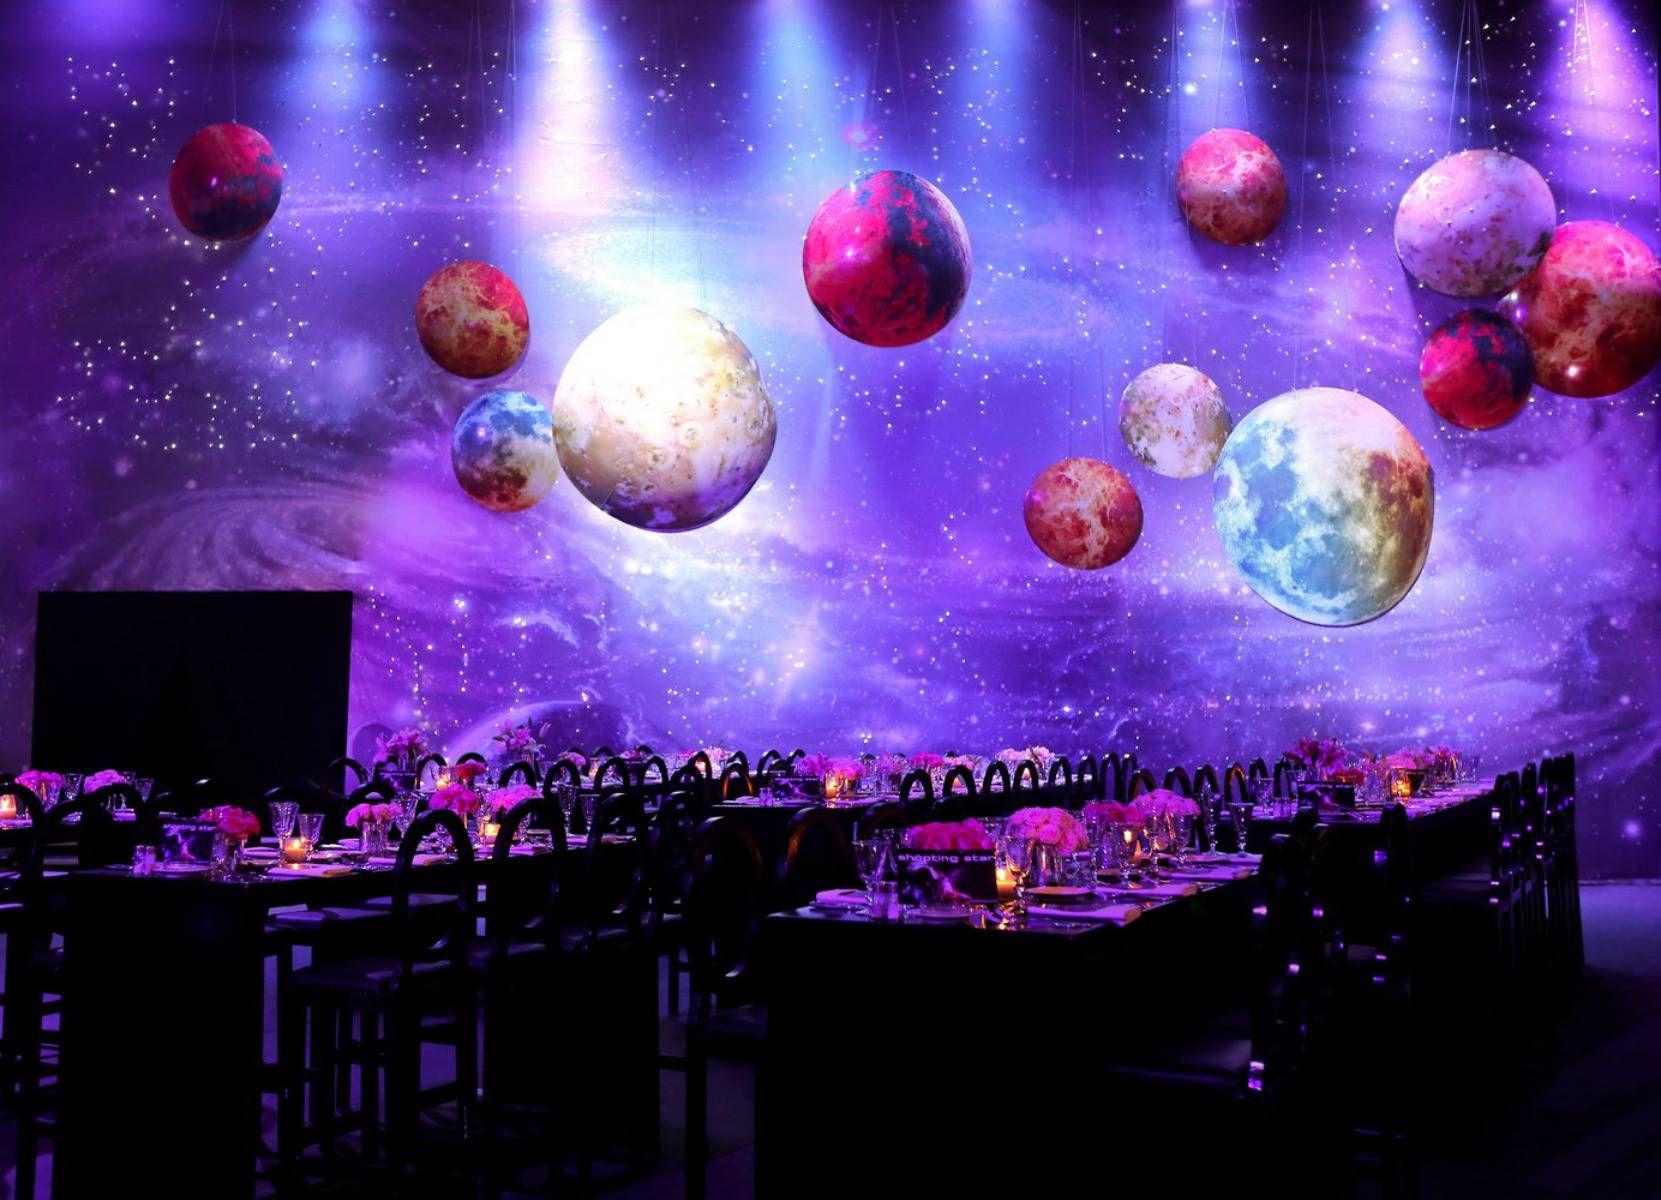 Wedded Wonderland Space Wedding Theme Space Theme Party Galaxy Wedding